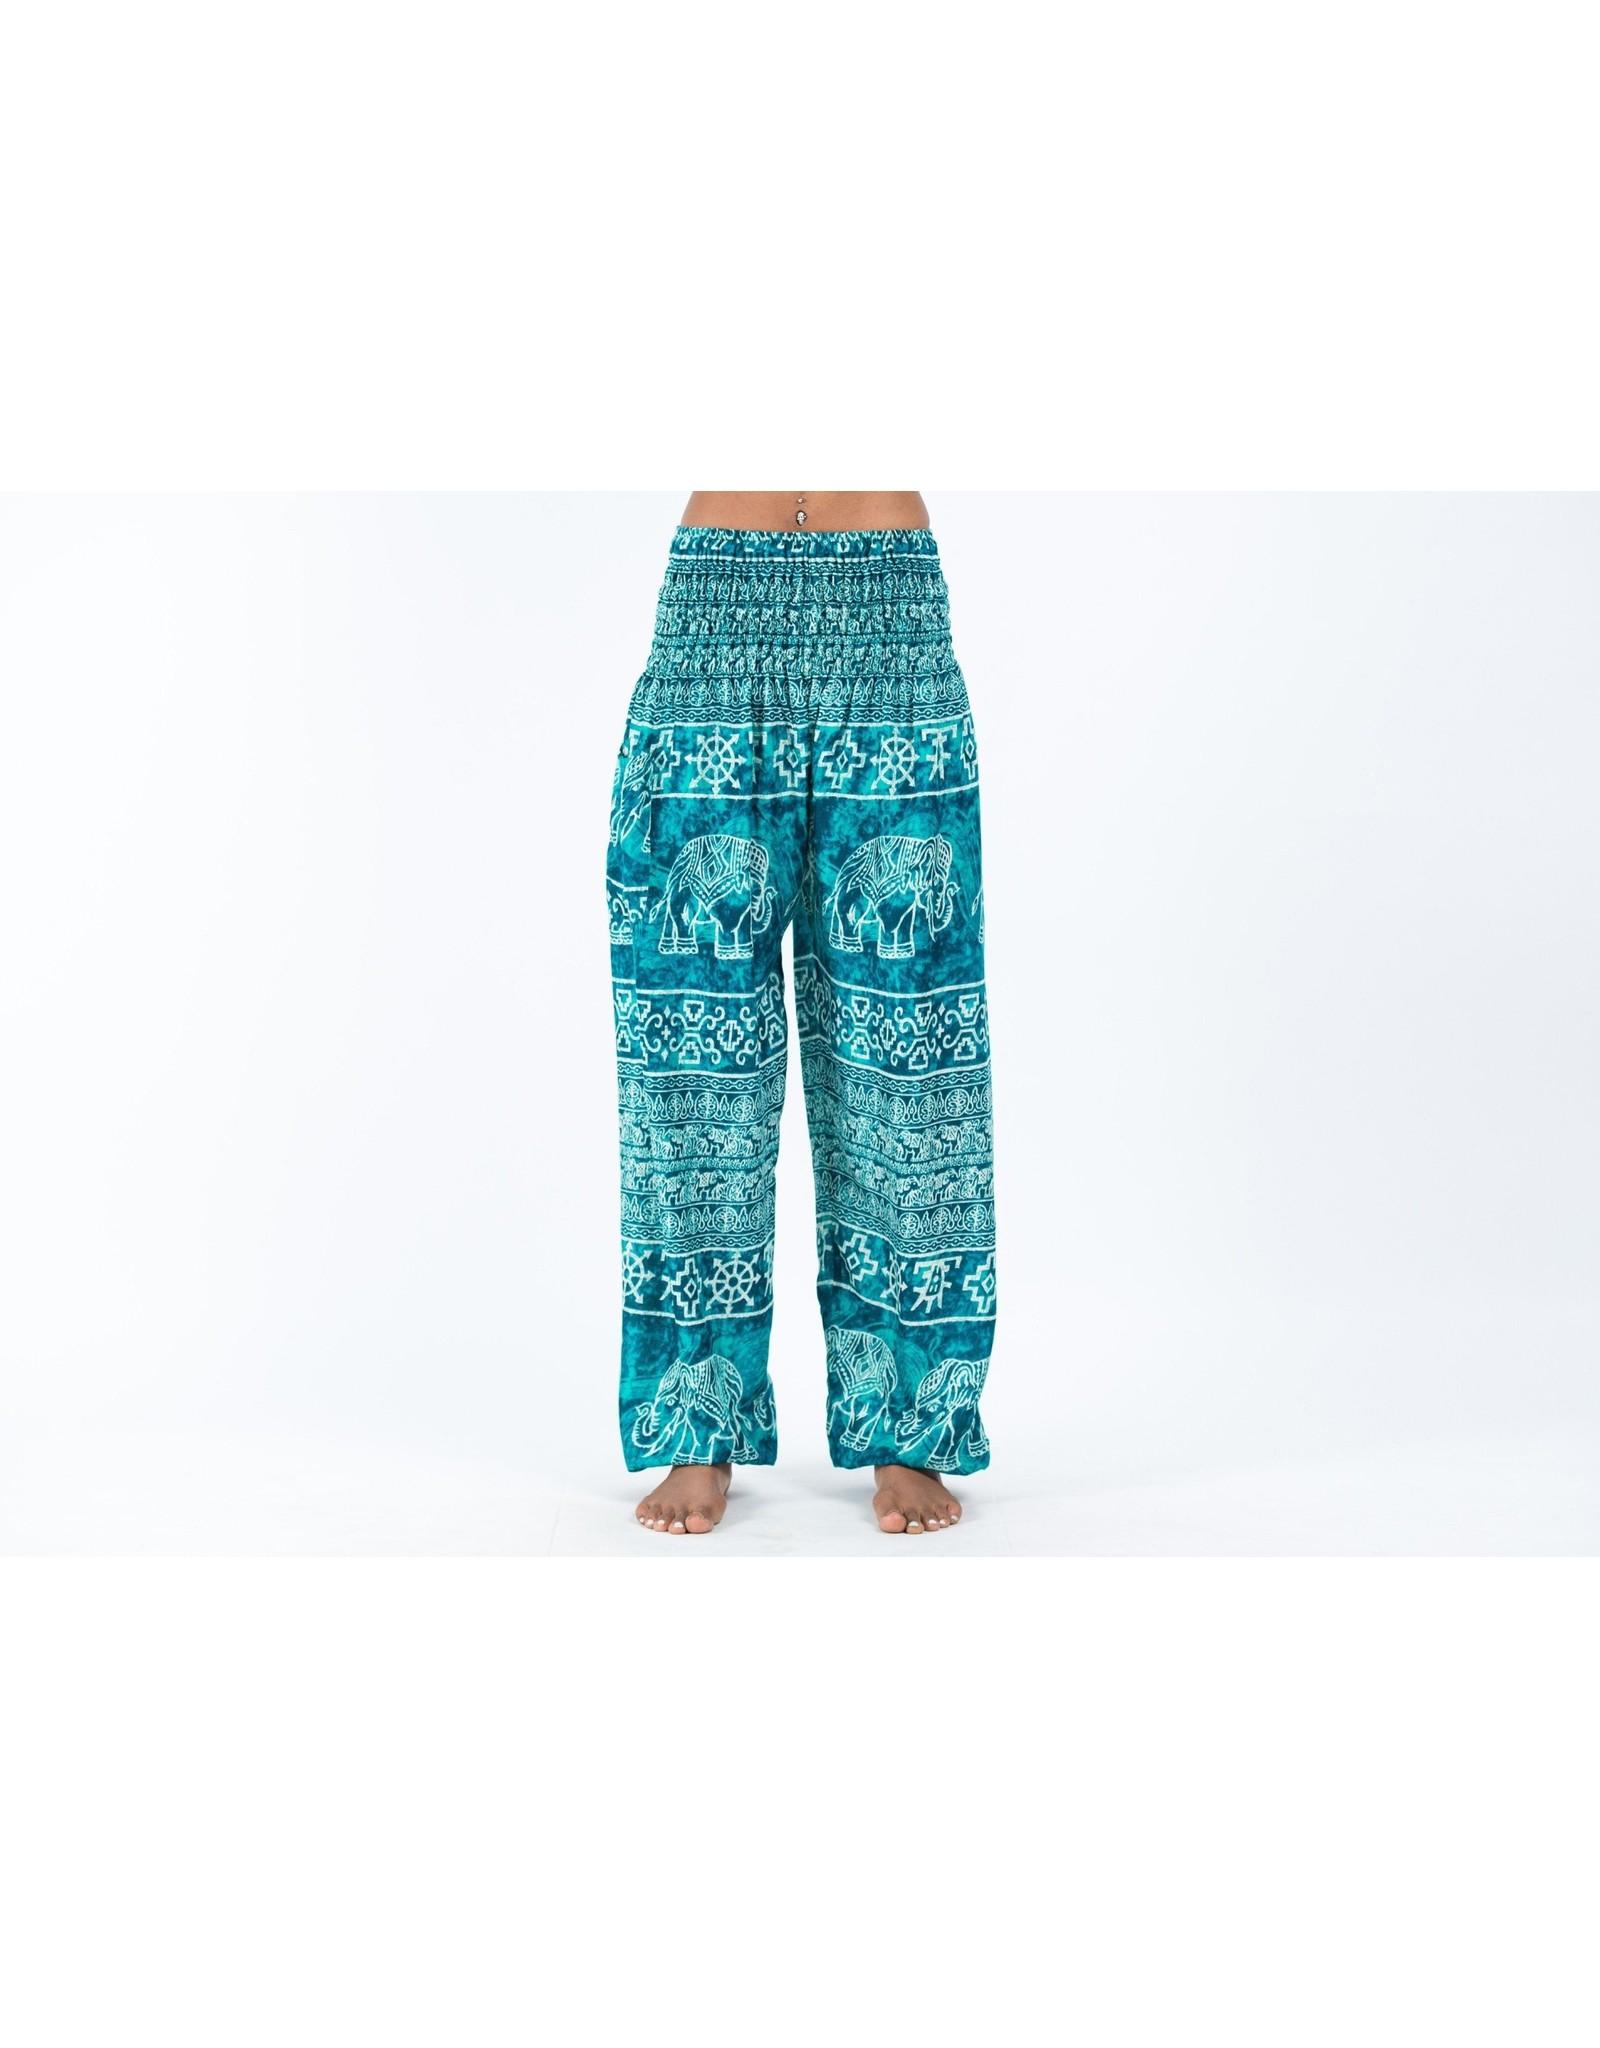 Elephant Pants, Marble Turquoise, Thailand